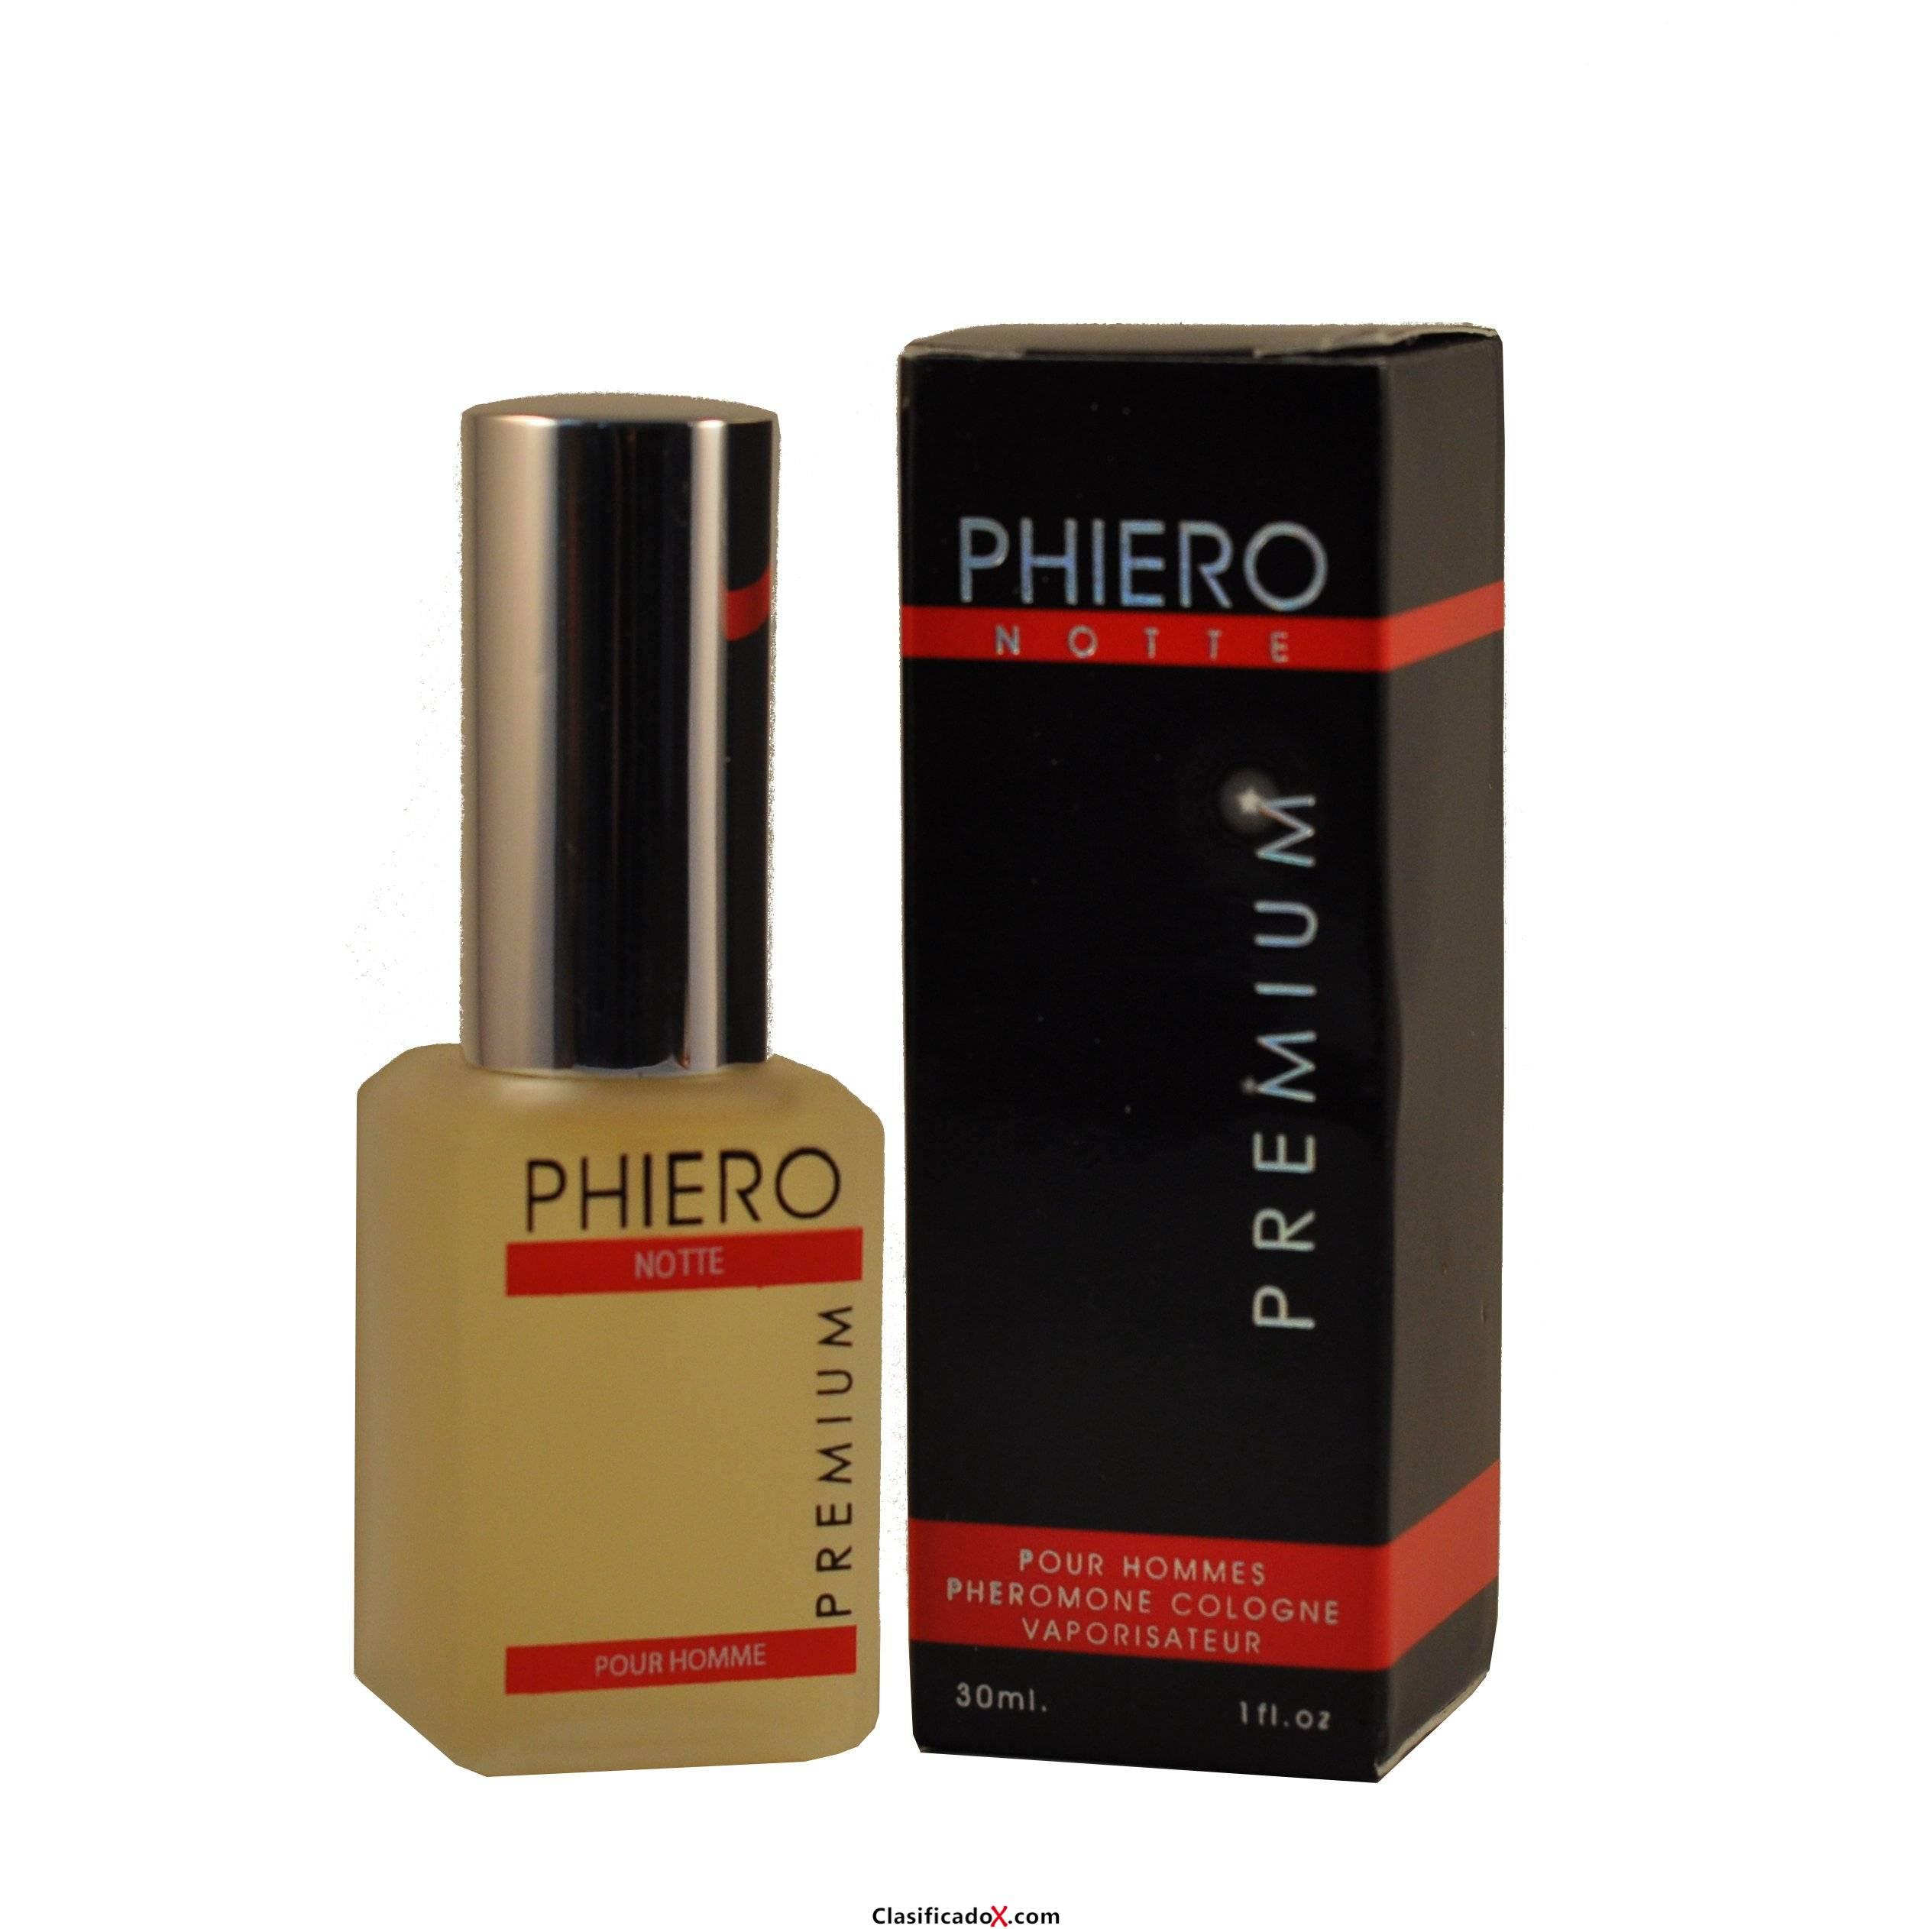 PHiERO notte PREMIUM - agua de colonia con feromonas para hombres 30ml espray. Envíos a Las Palmas